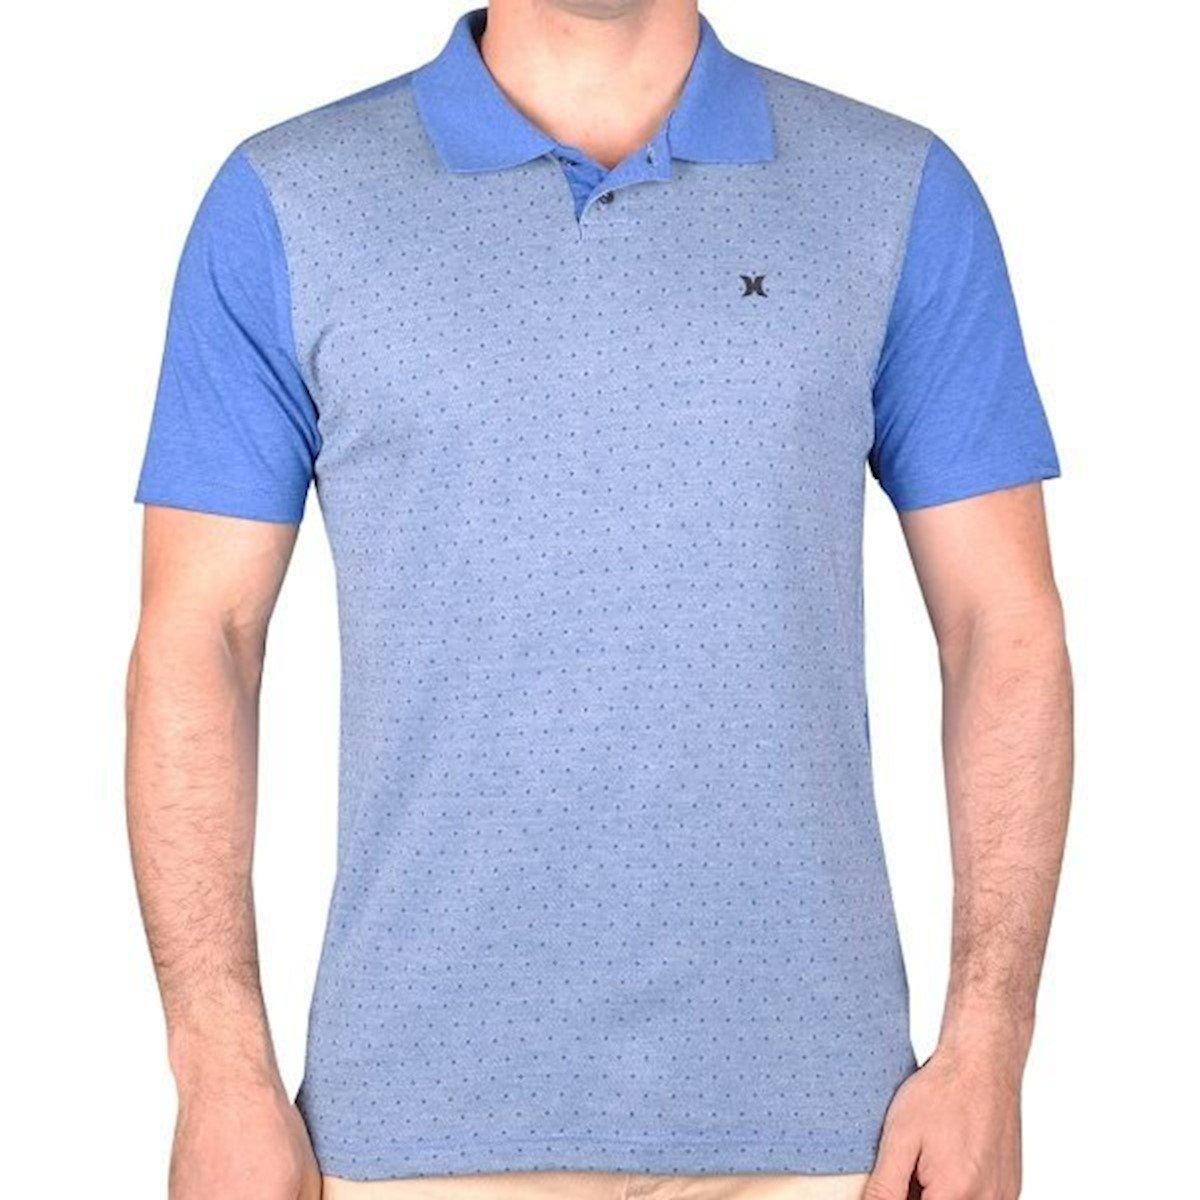 Camisa Poa Hurley Masculina - Compre Agora  0c8c99c8f02